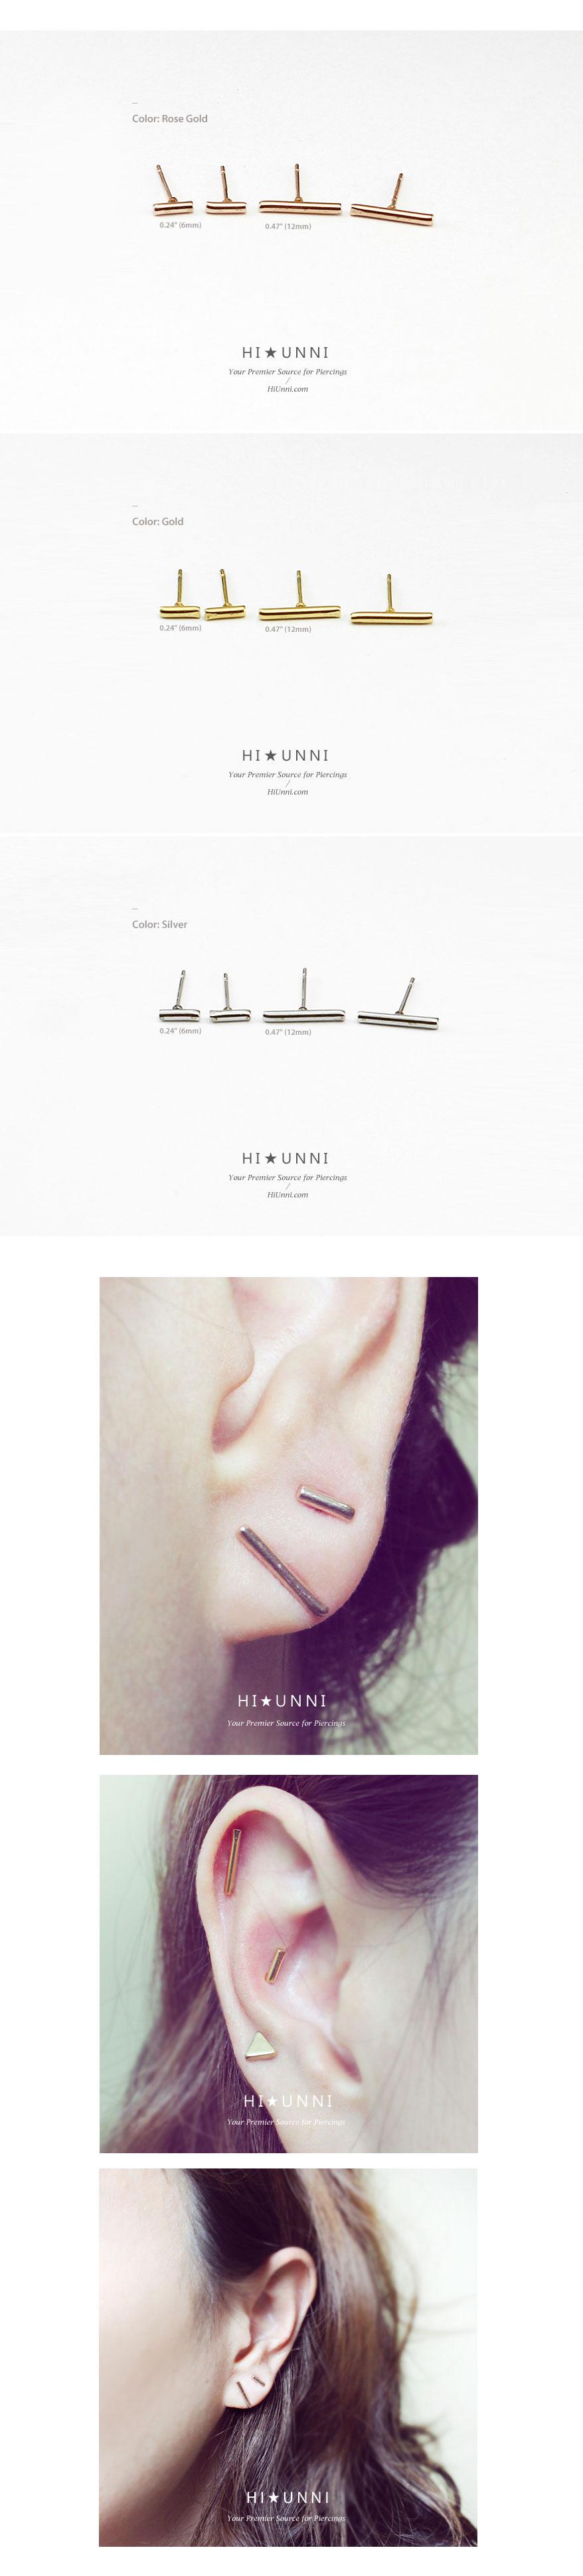 accessories_ear_stud_earrings_korean_asian_style_jewelry_18k_stick_bar_rose_gold_trendy_4